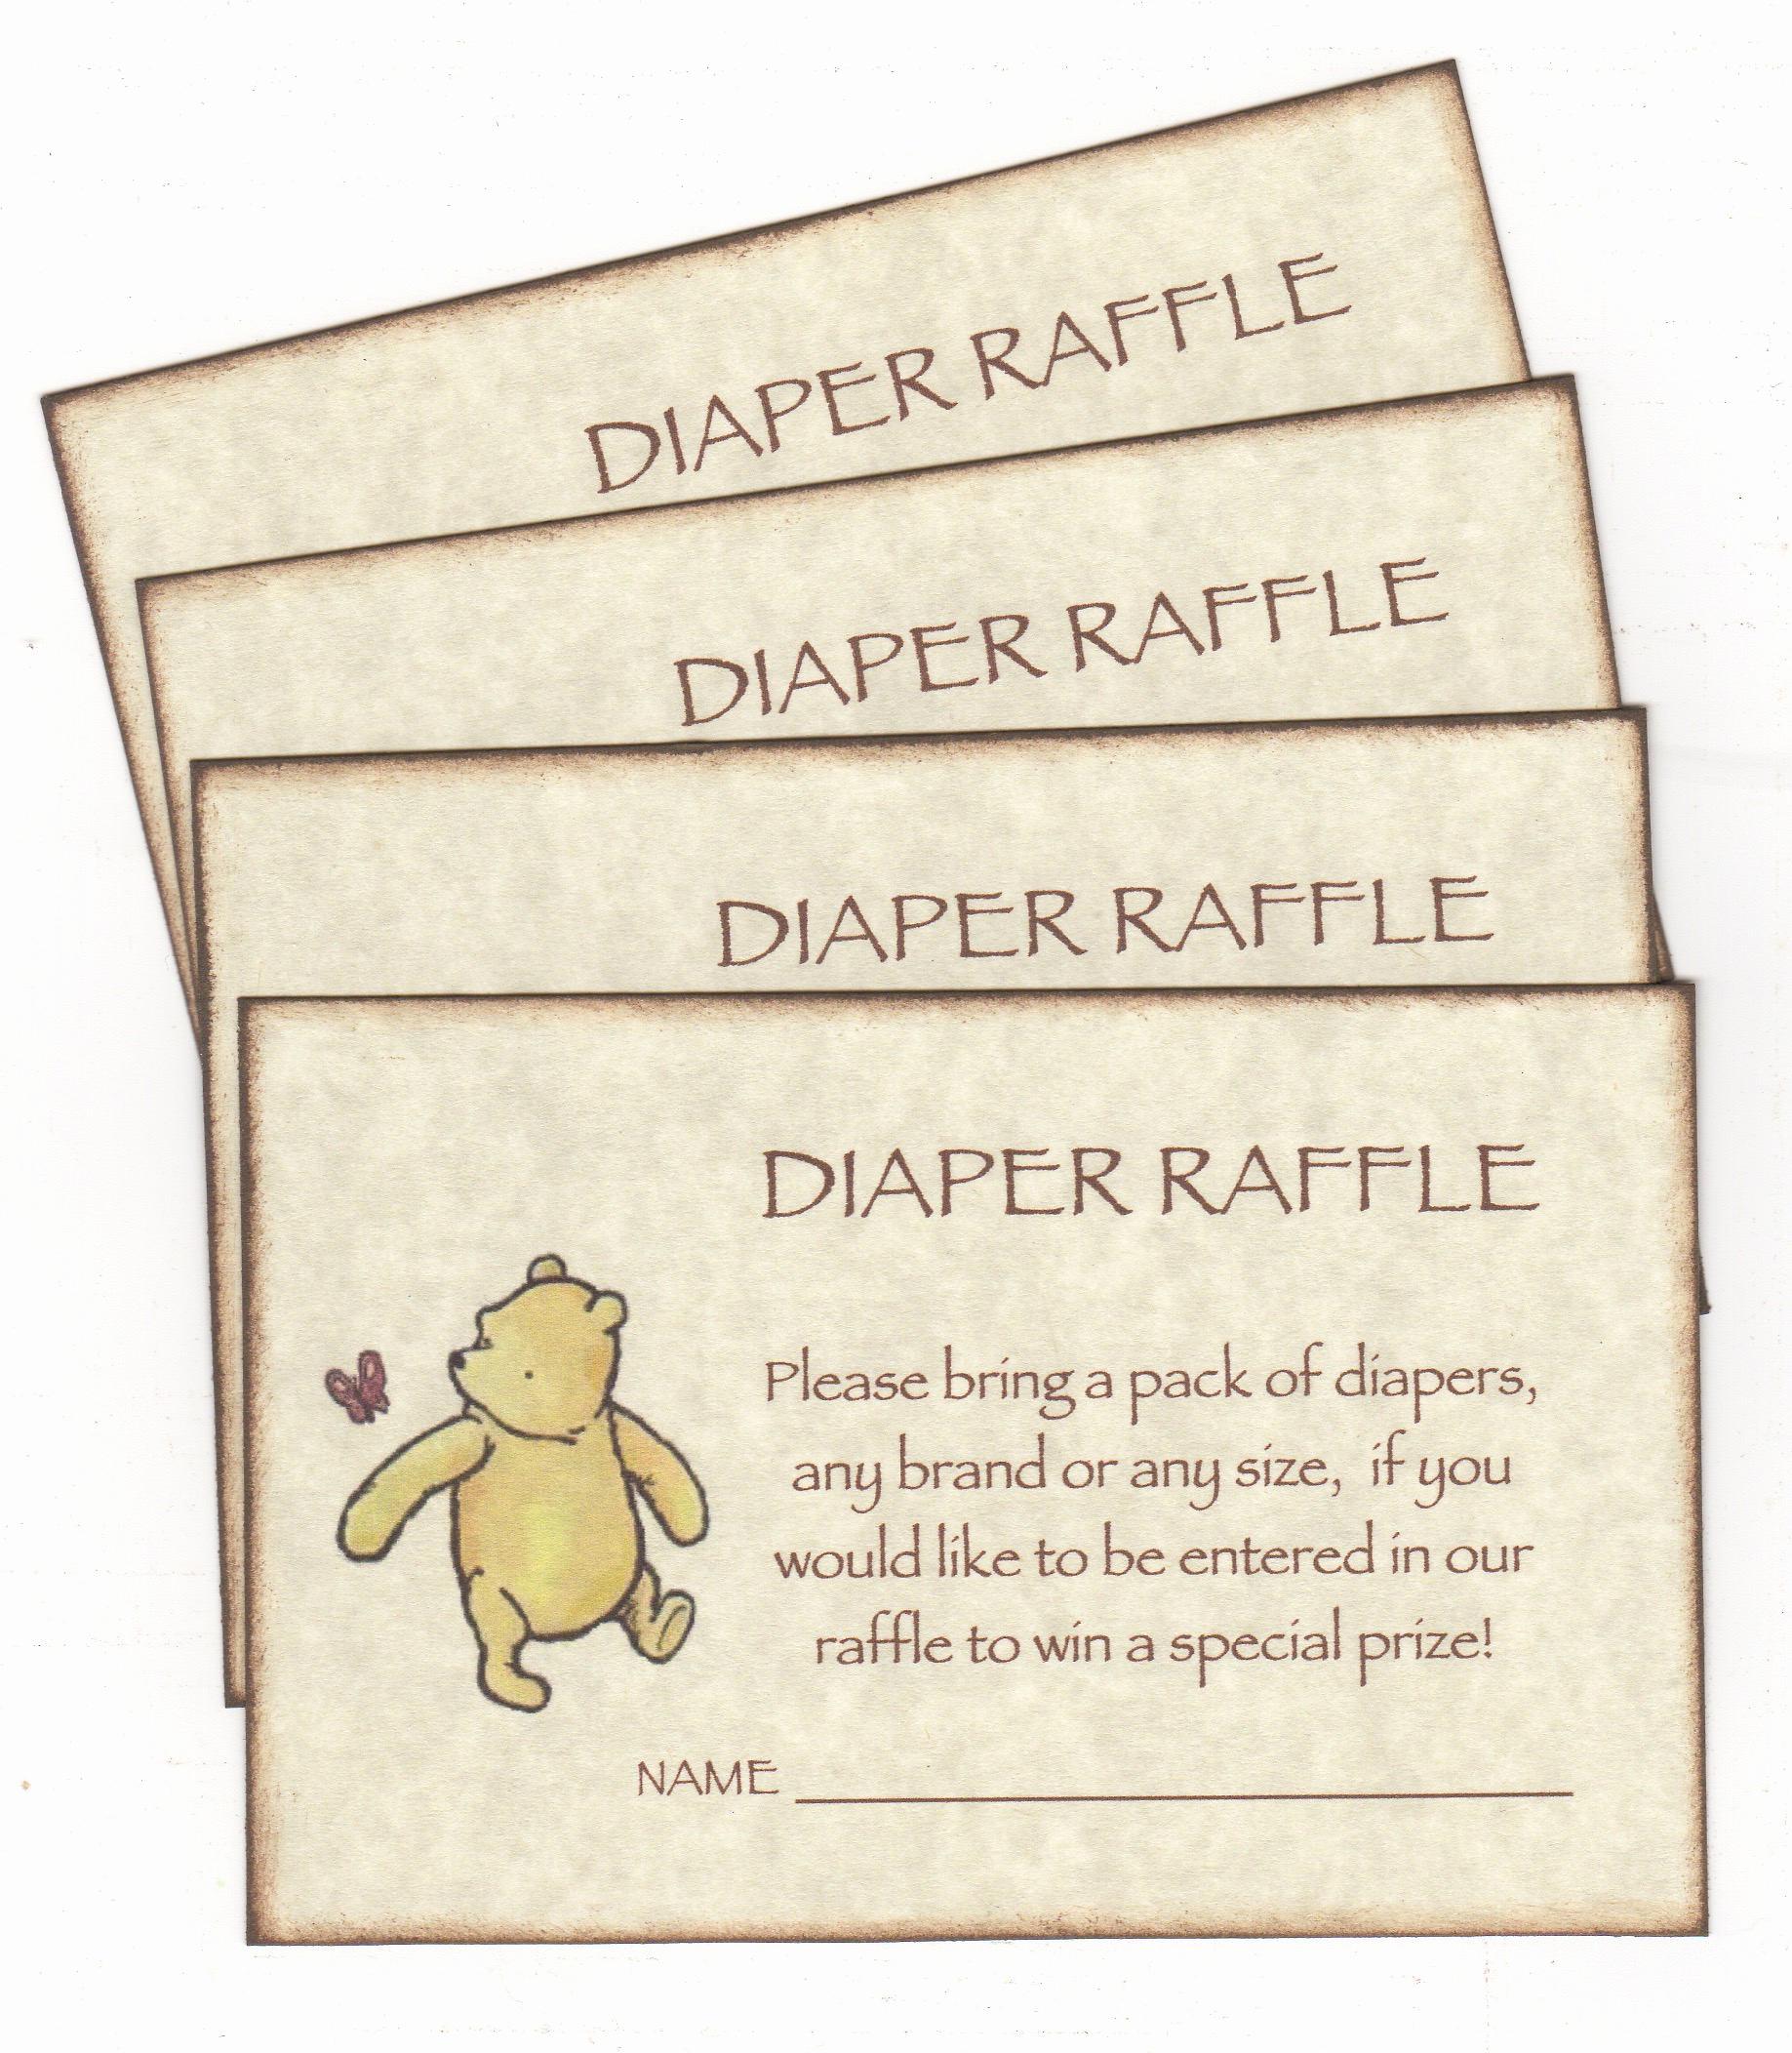 Diaper Raffle Wording On Invitation Luxury Winnie the Pooh Diaper Raffle Invitation Add for Baby